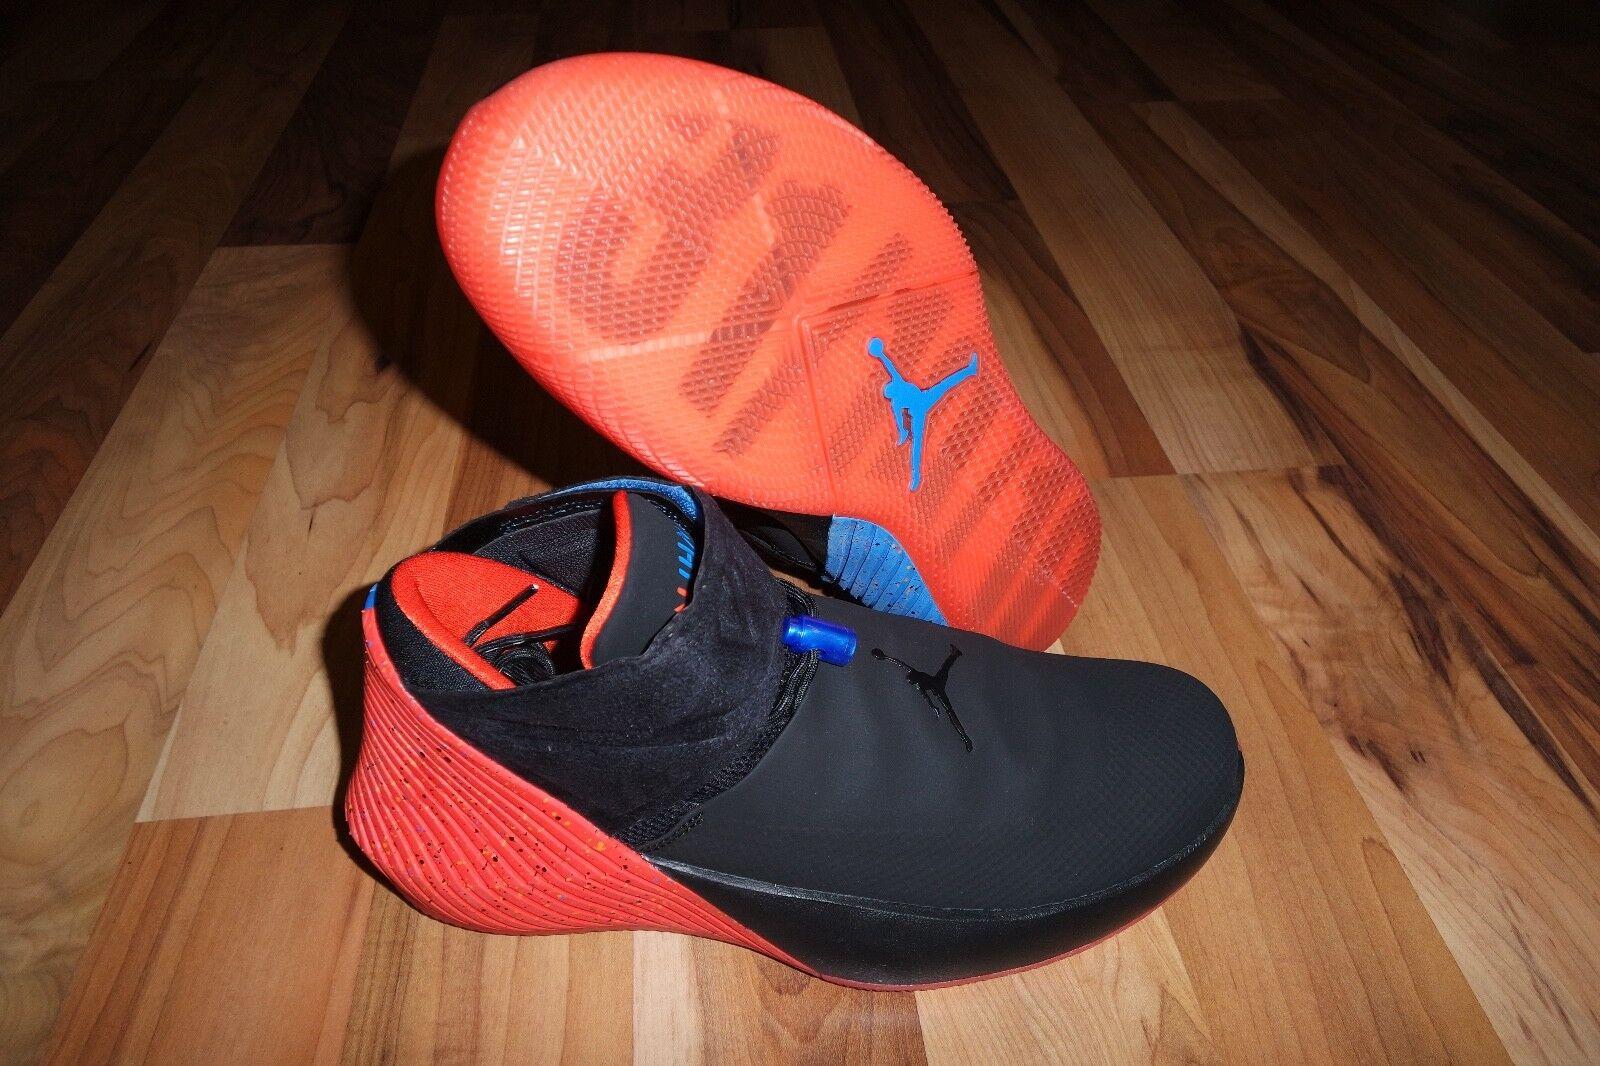 NIKE JORDAN WhyNot Zer0.1 RW Triple Double Basketball shoes AA2510 007 US 11.5